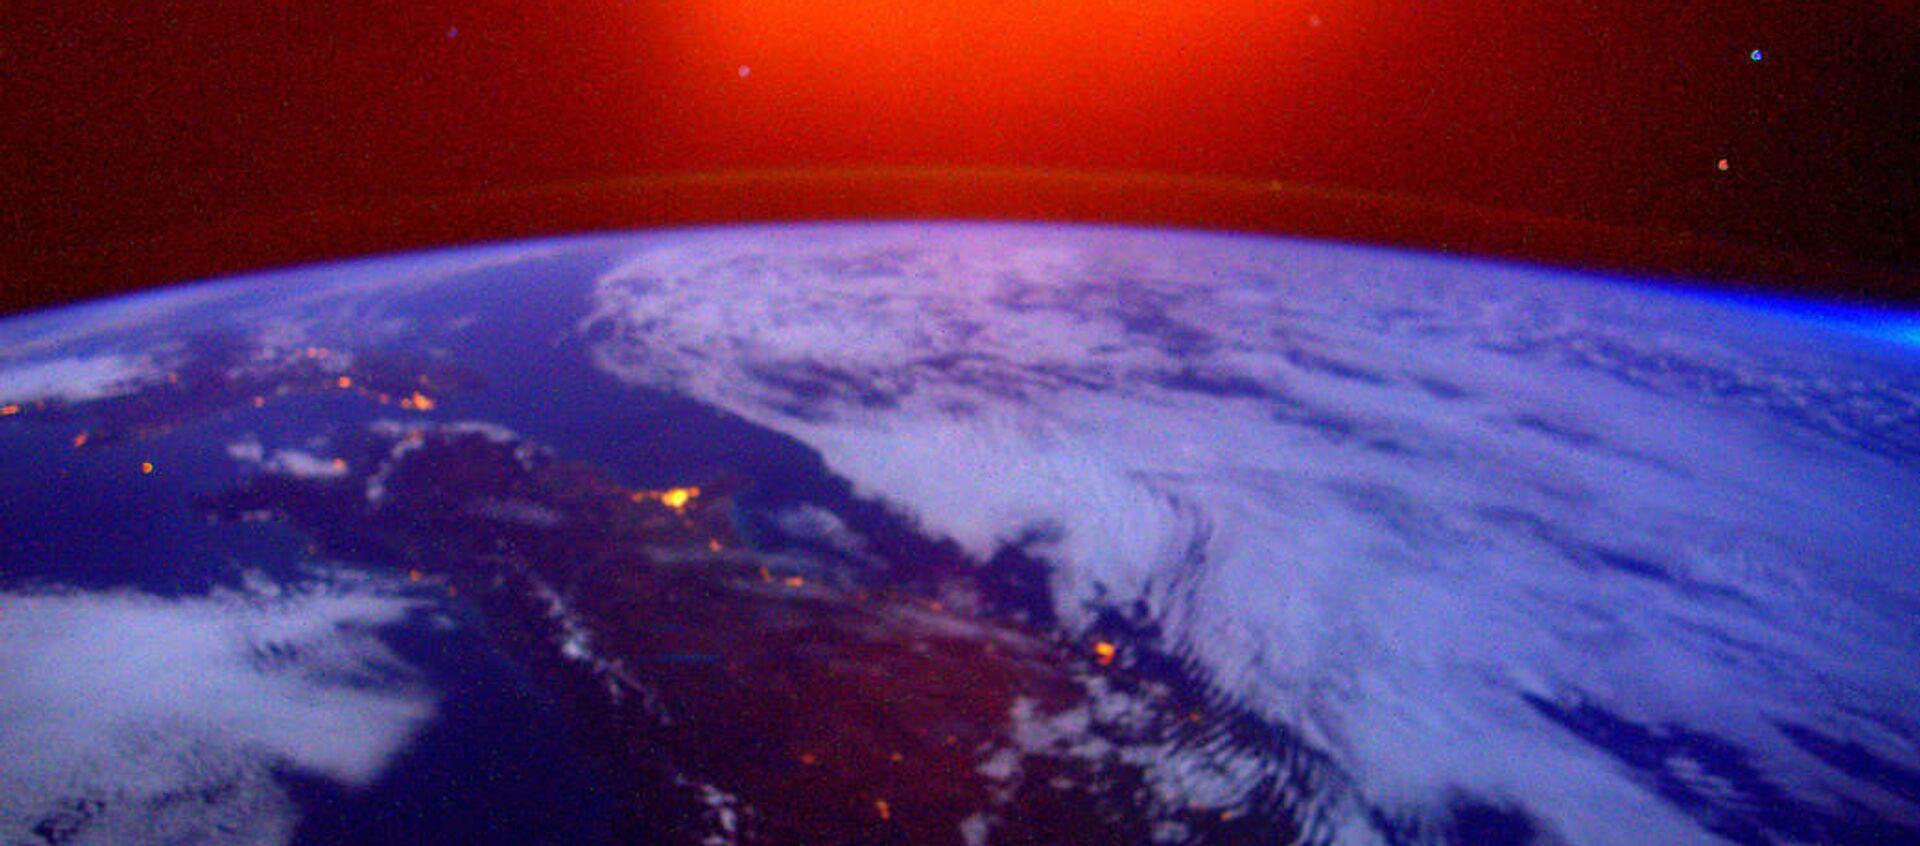 Una foto della Terra presa dall'ISS - Sputnik Italia, 1920, 15.04.2021